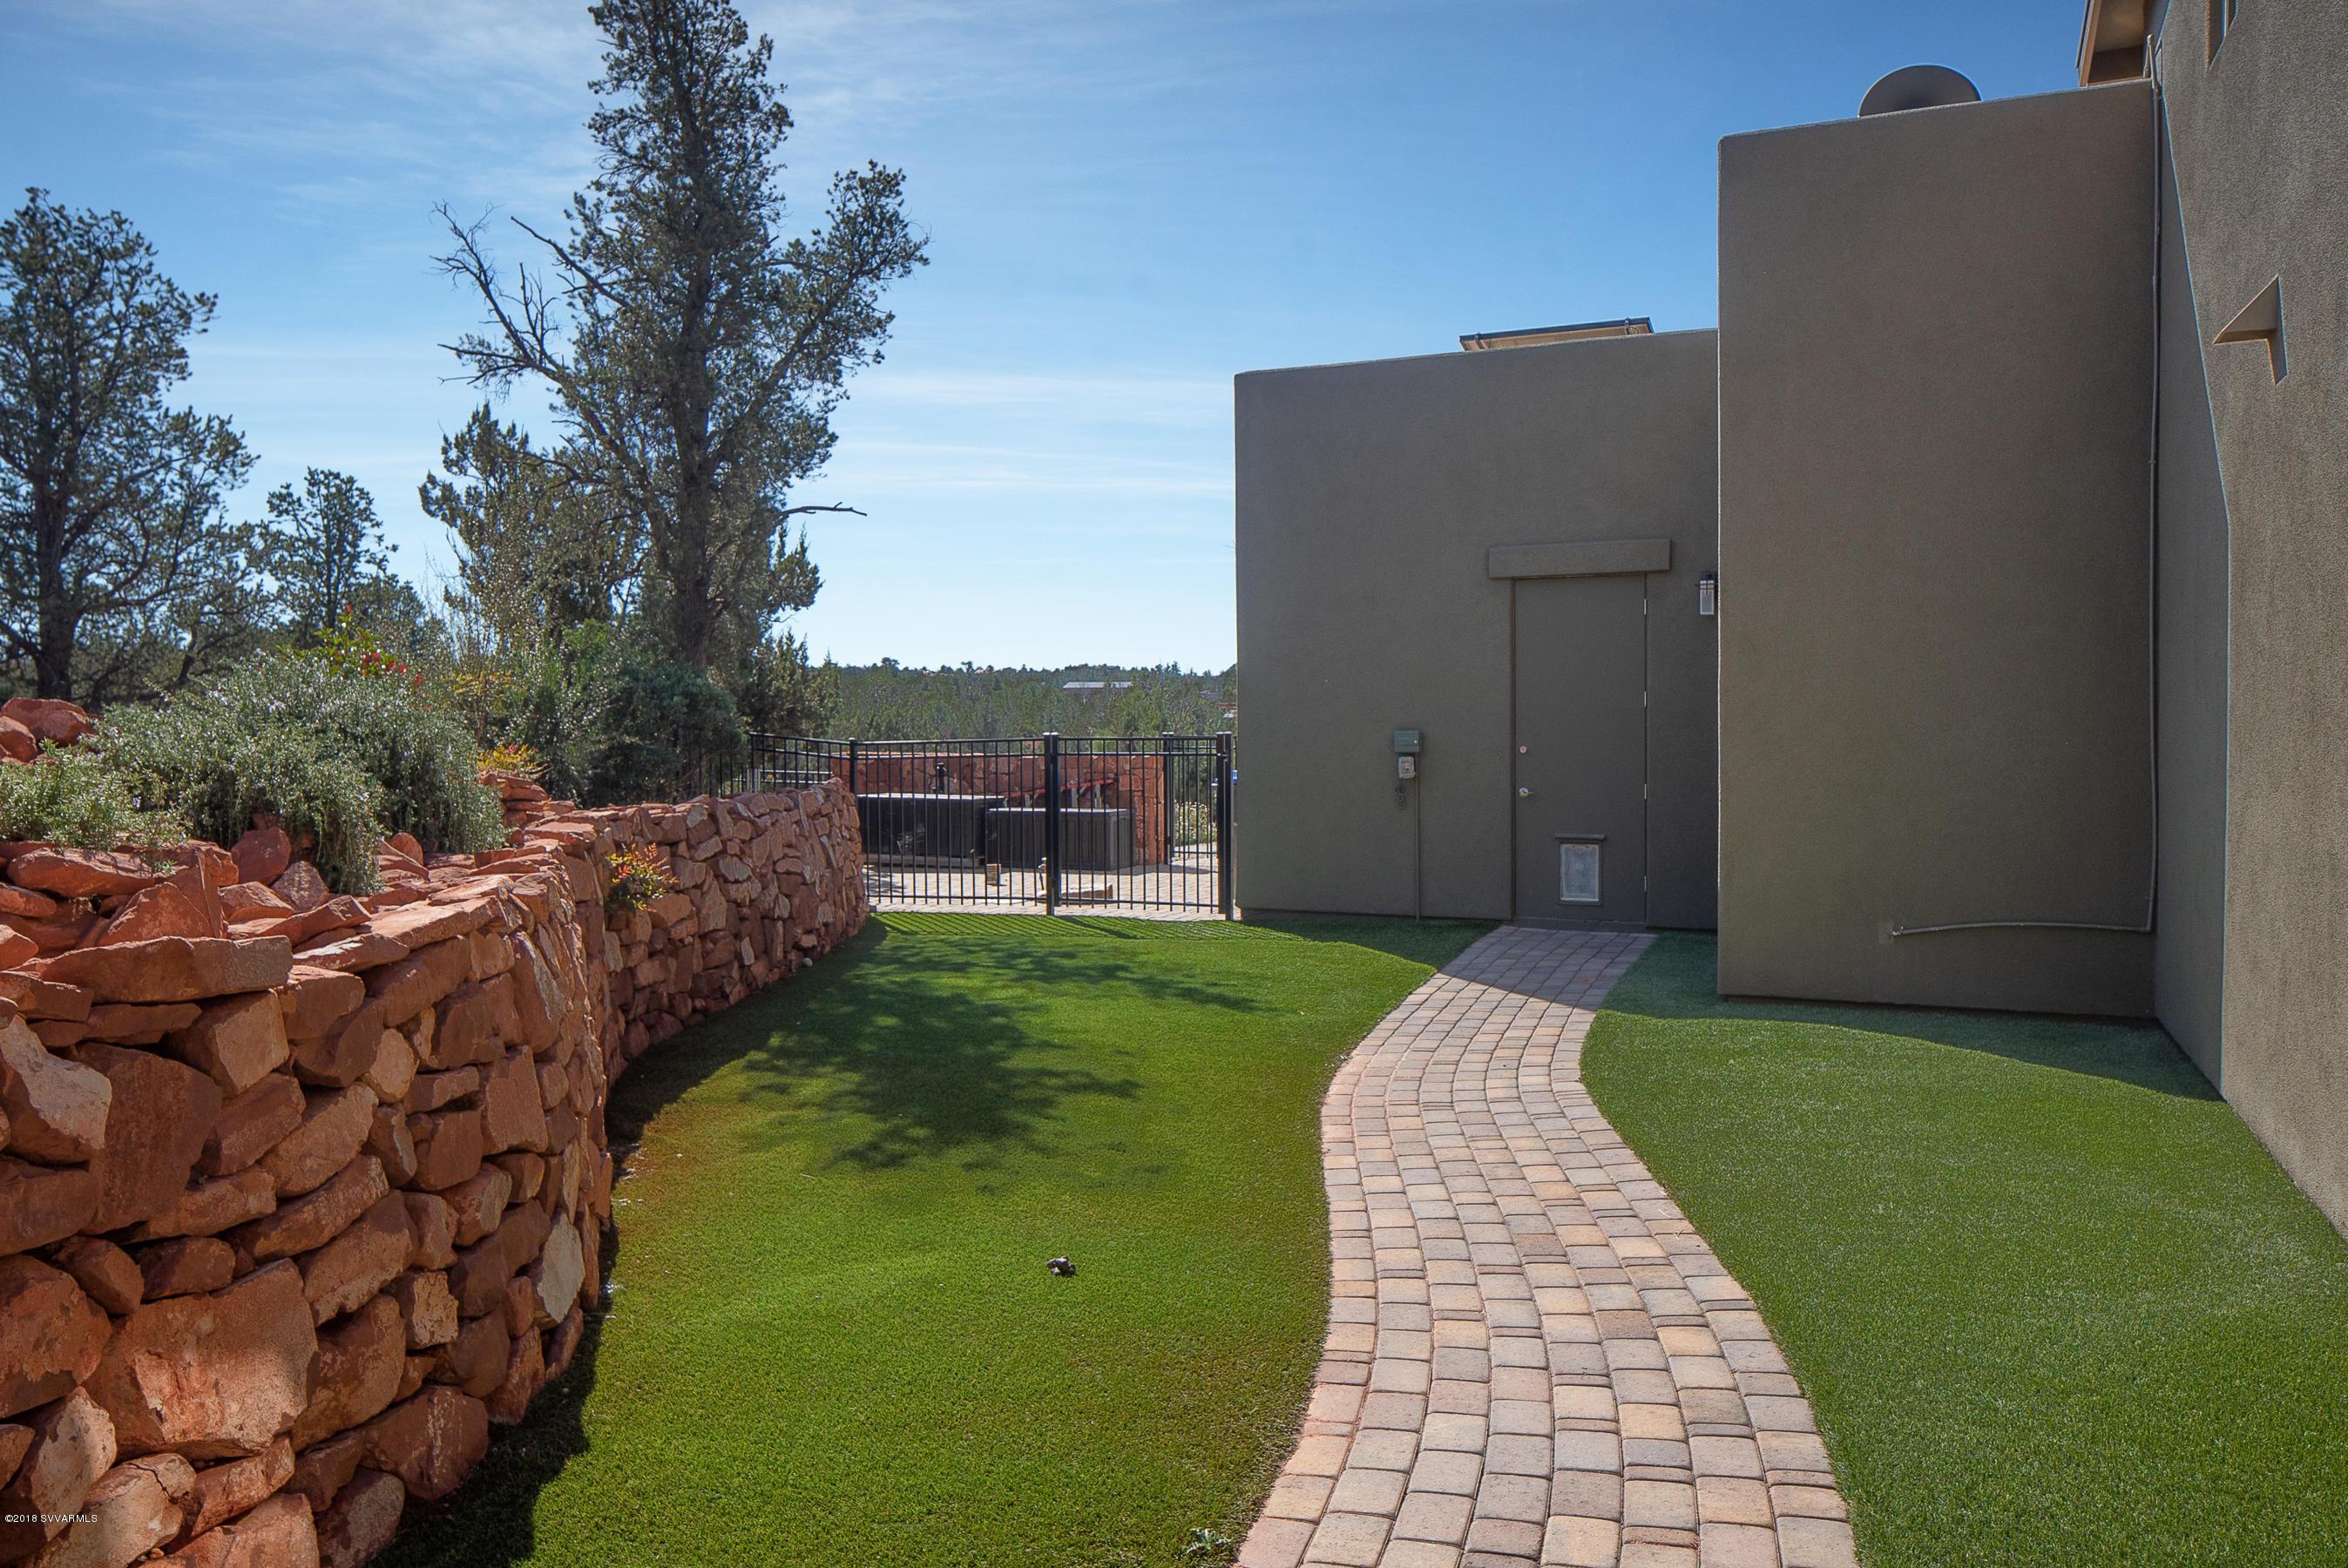 80 Rimstone Circle Sedona, AZ 86336